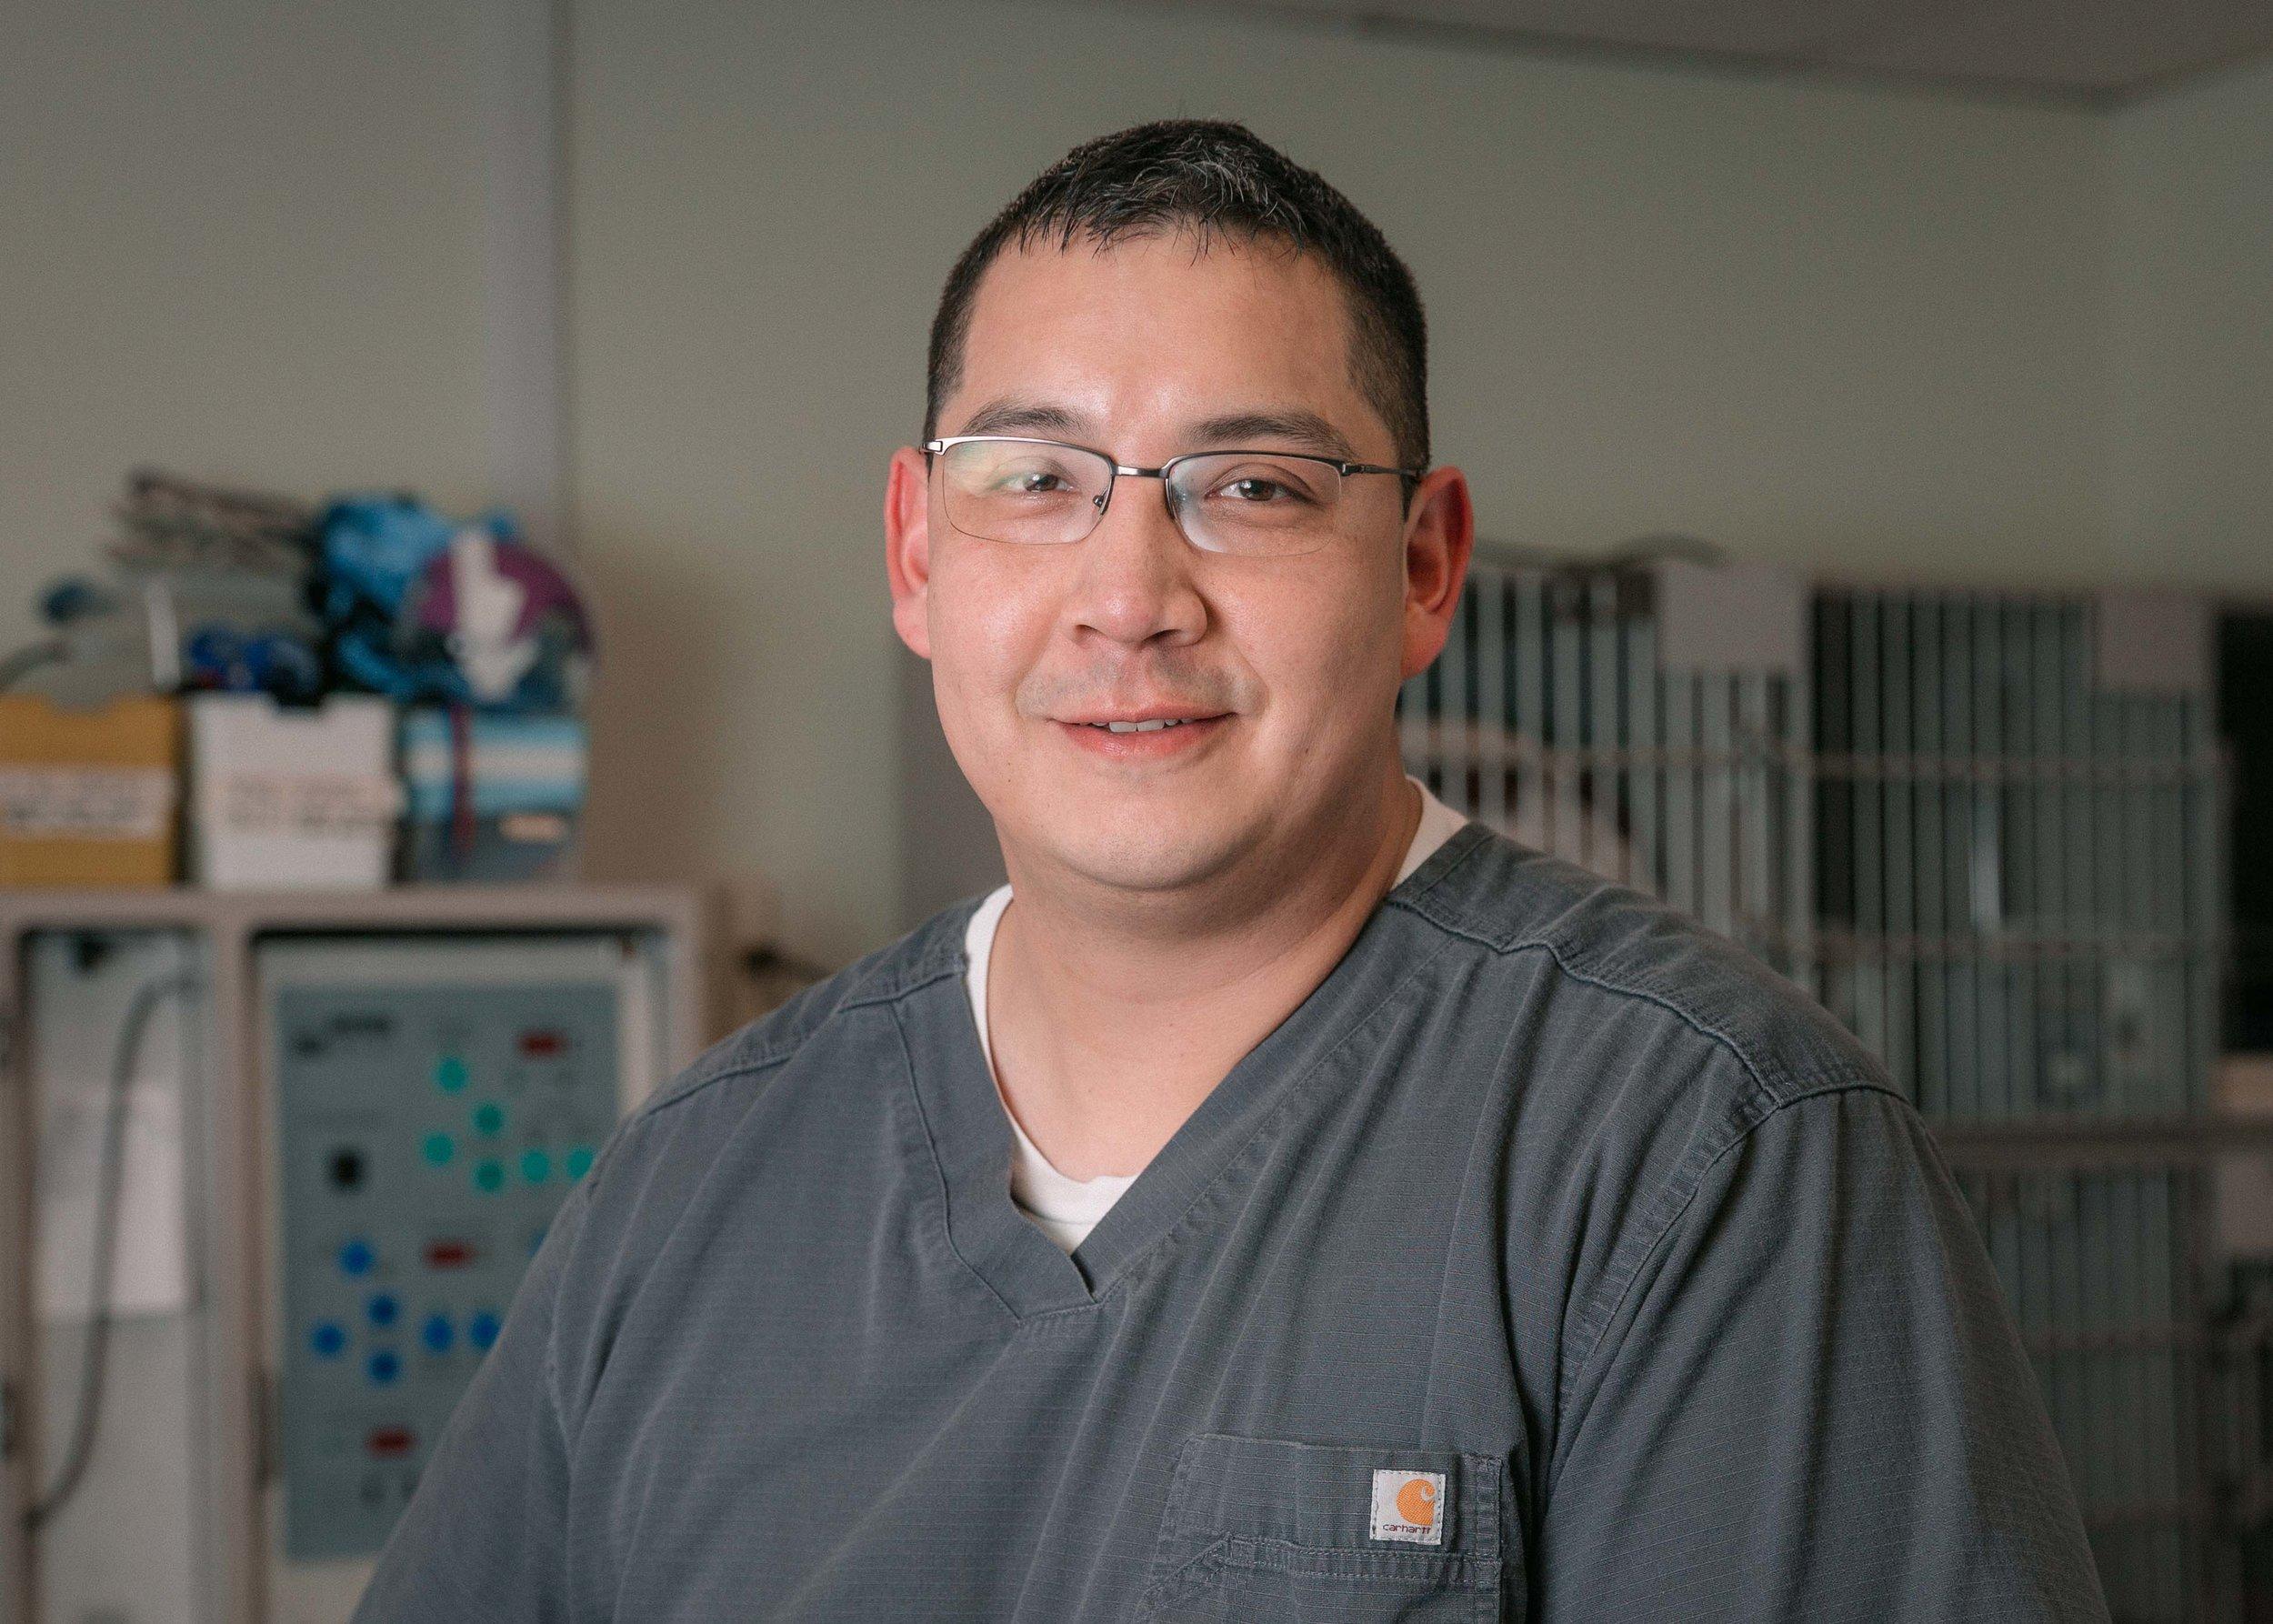 Dr. LittleJim